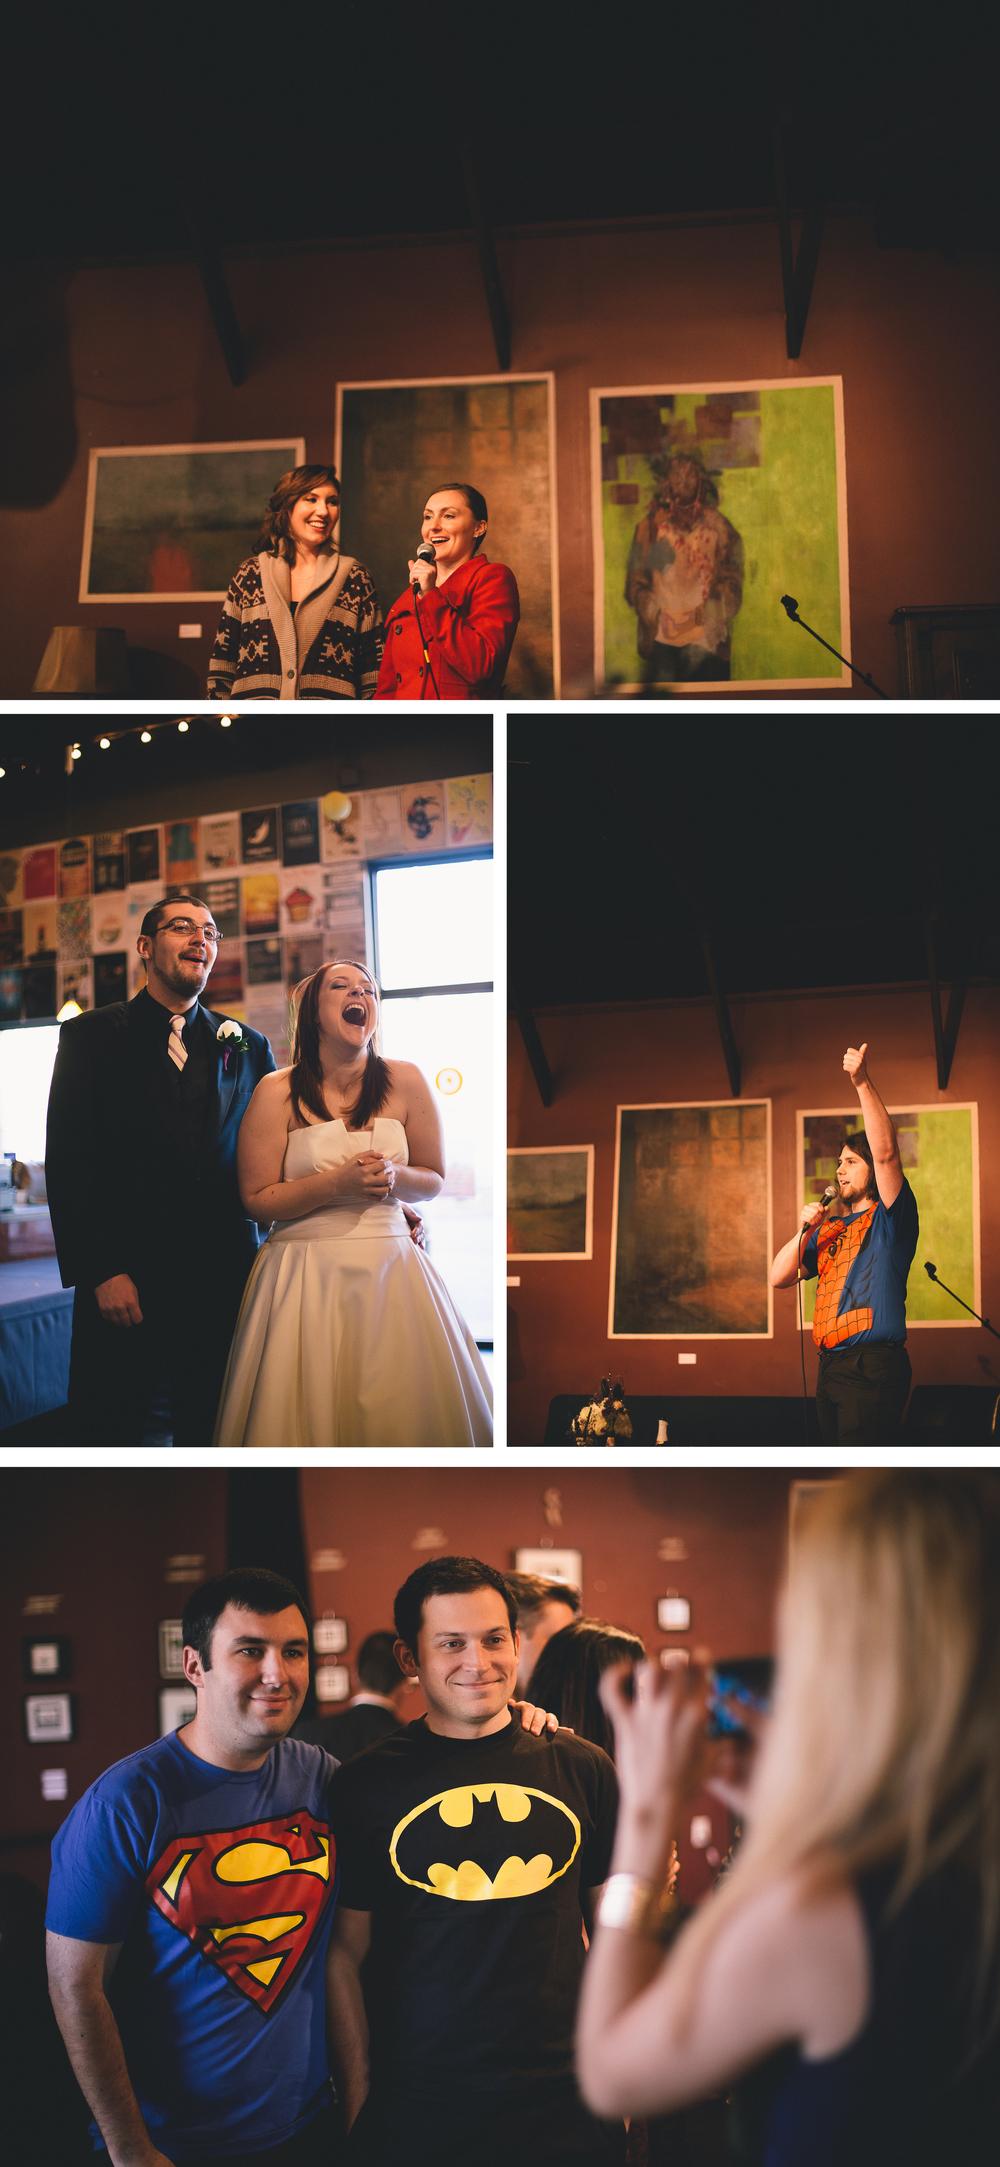 Eklund-Wedding-Q-Cafe-Reception-7.jpg